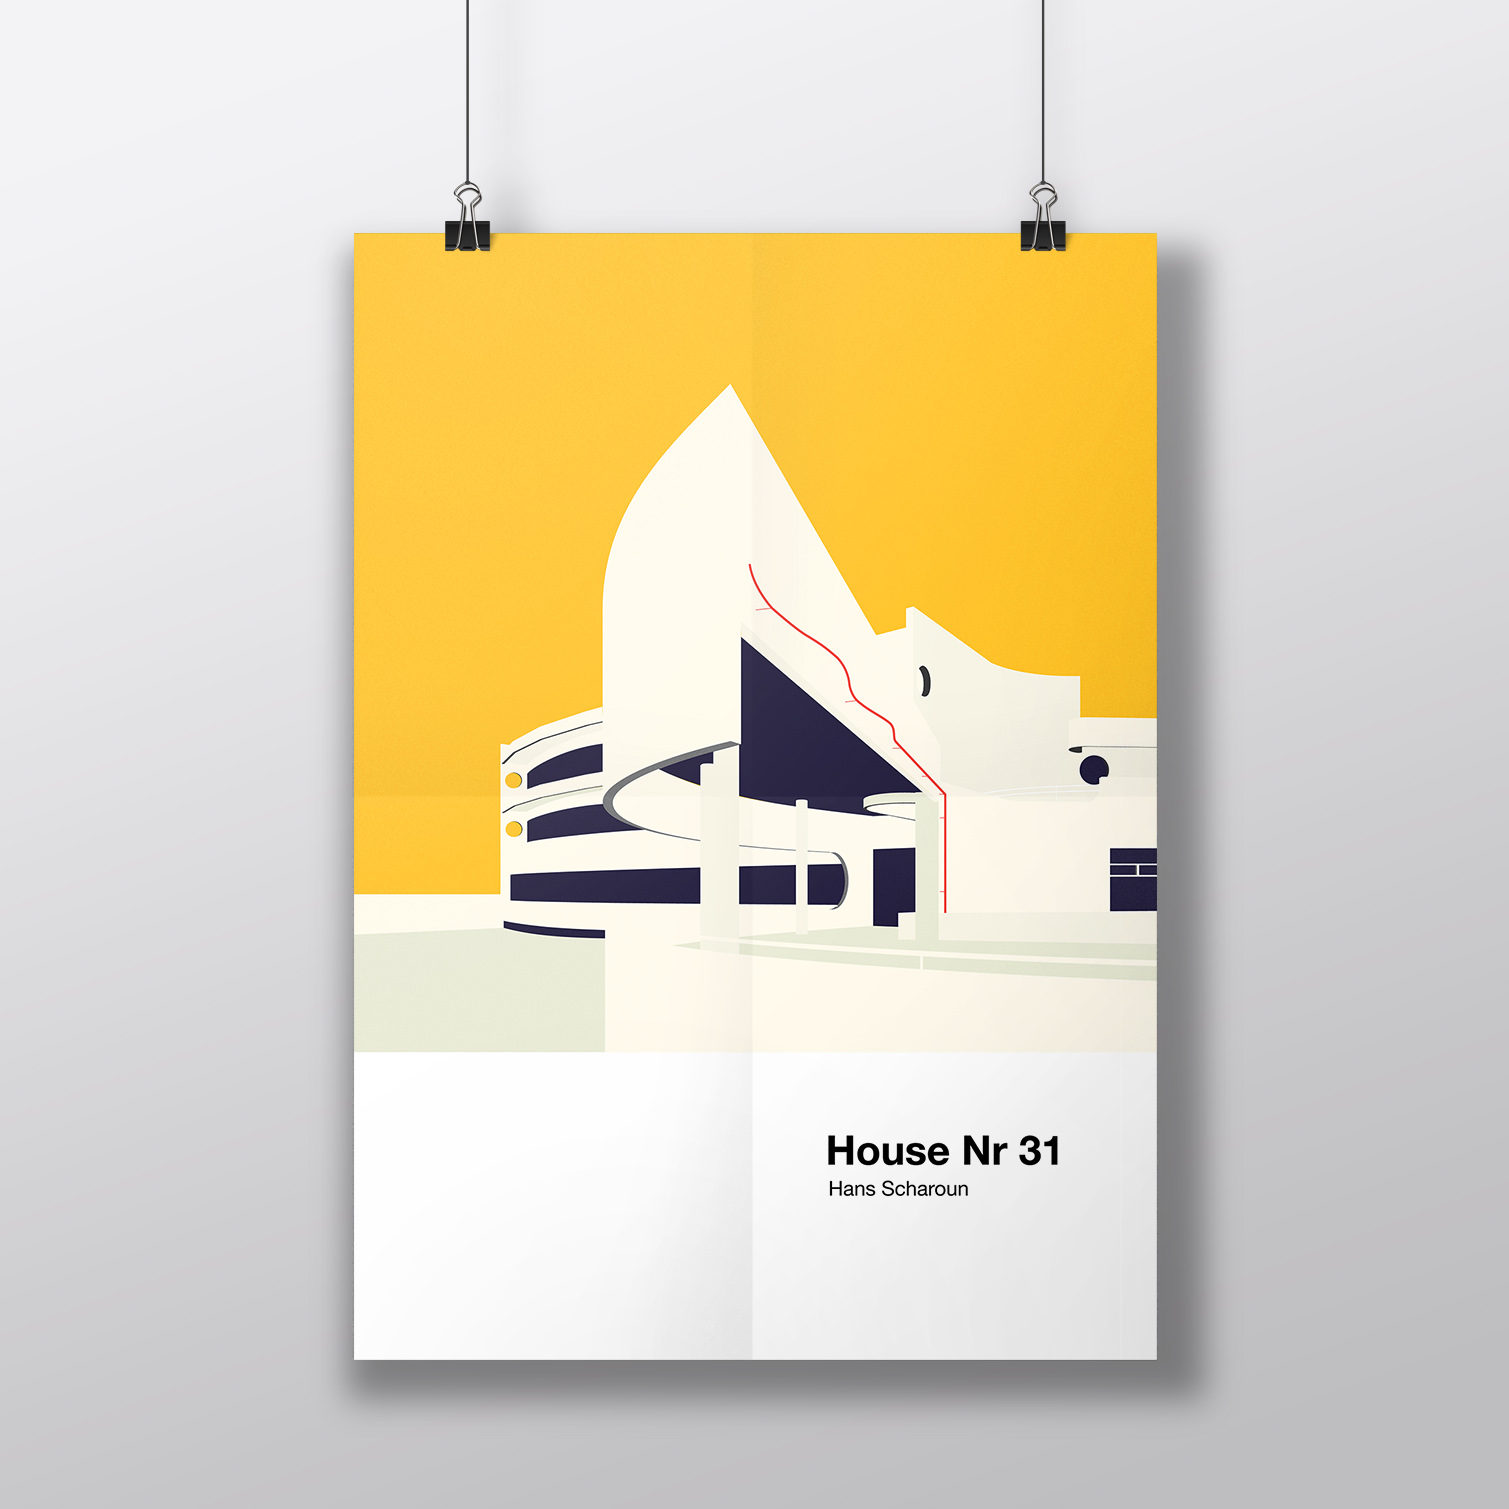 arch_it piotr zybura architecture poster wuwa wroclaw house 31